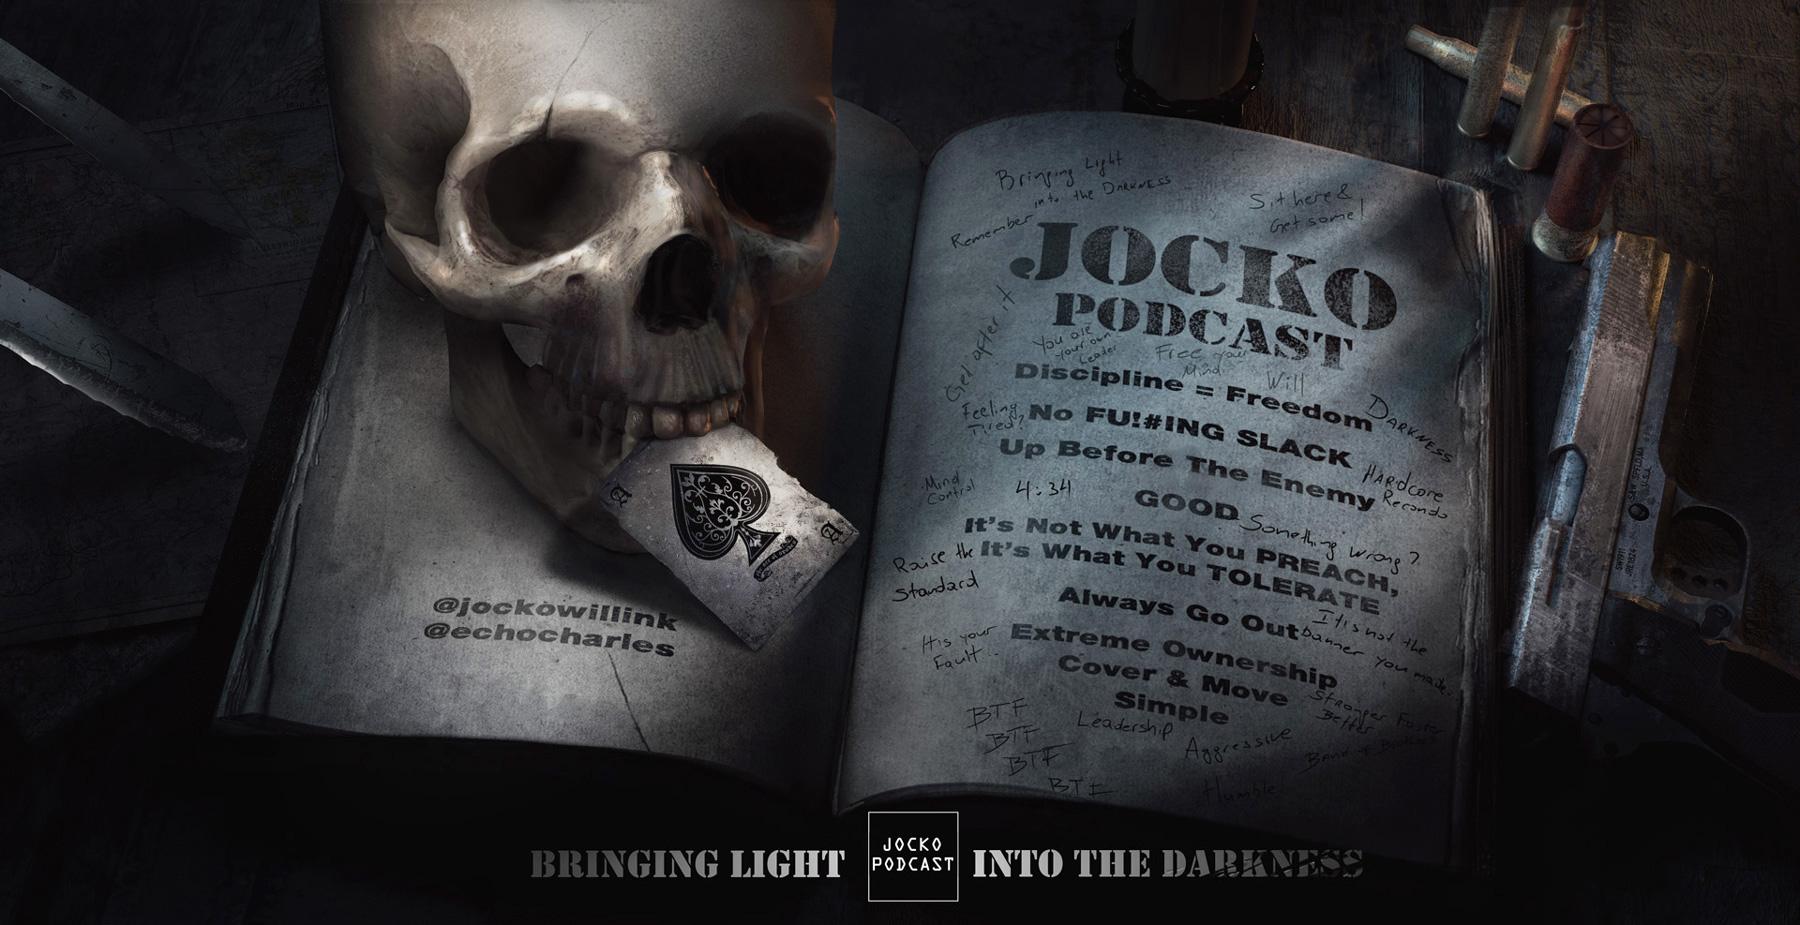 Jocko-Podcast-Bringing-Light-Into-The-Darkness-Illustration-Concept-Art-Volen-CK_3